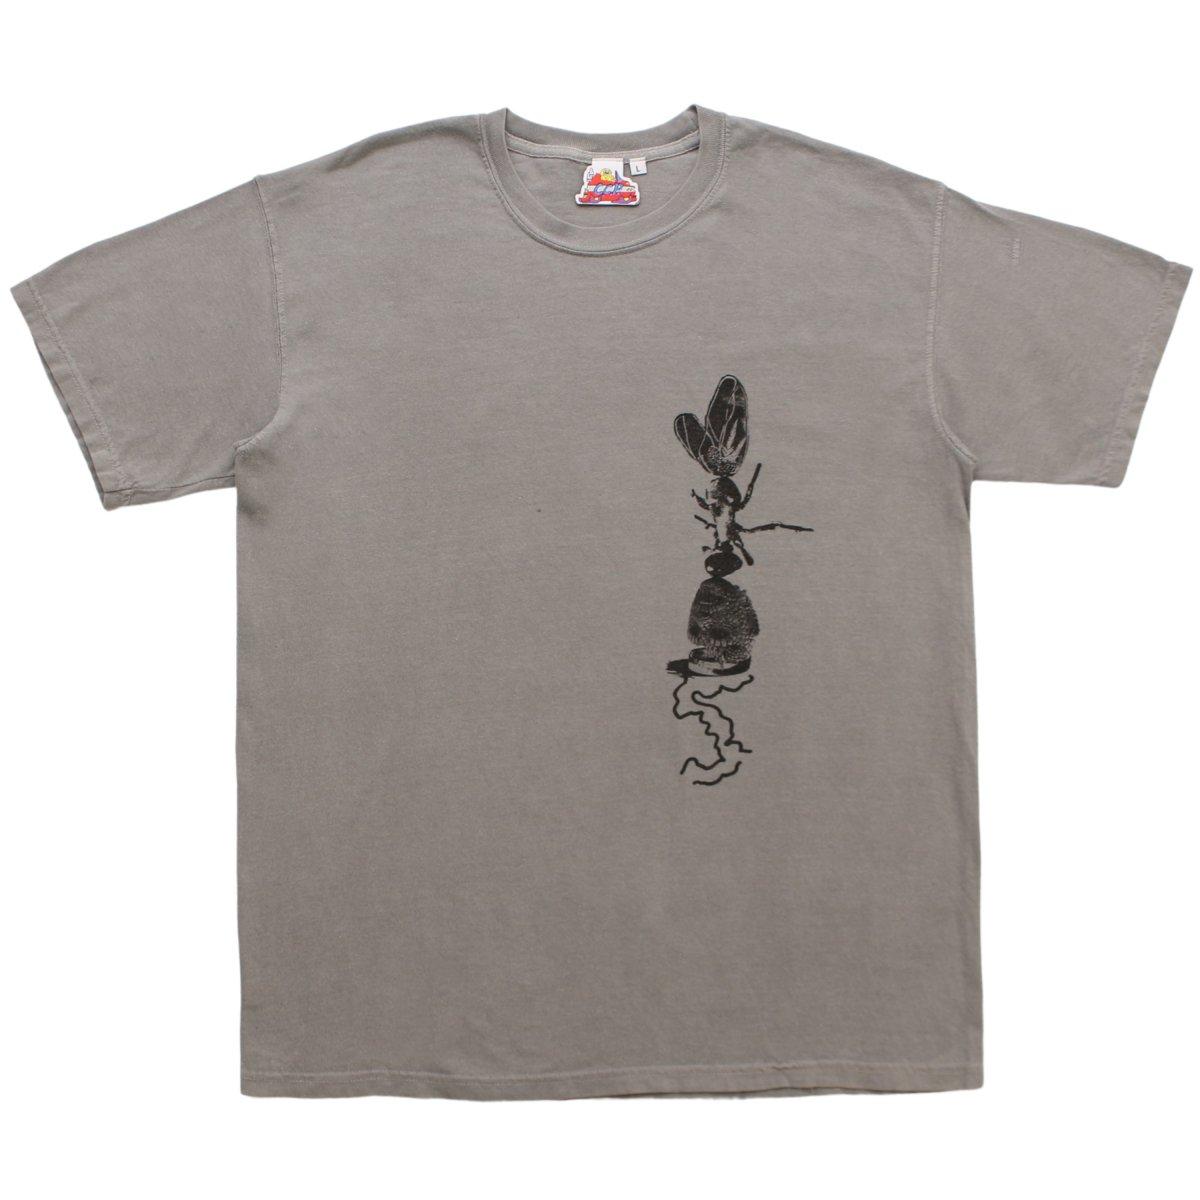 Ed Davis x BIEN T-shirt【GREY】